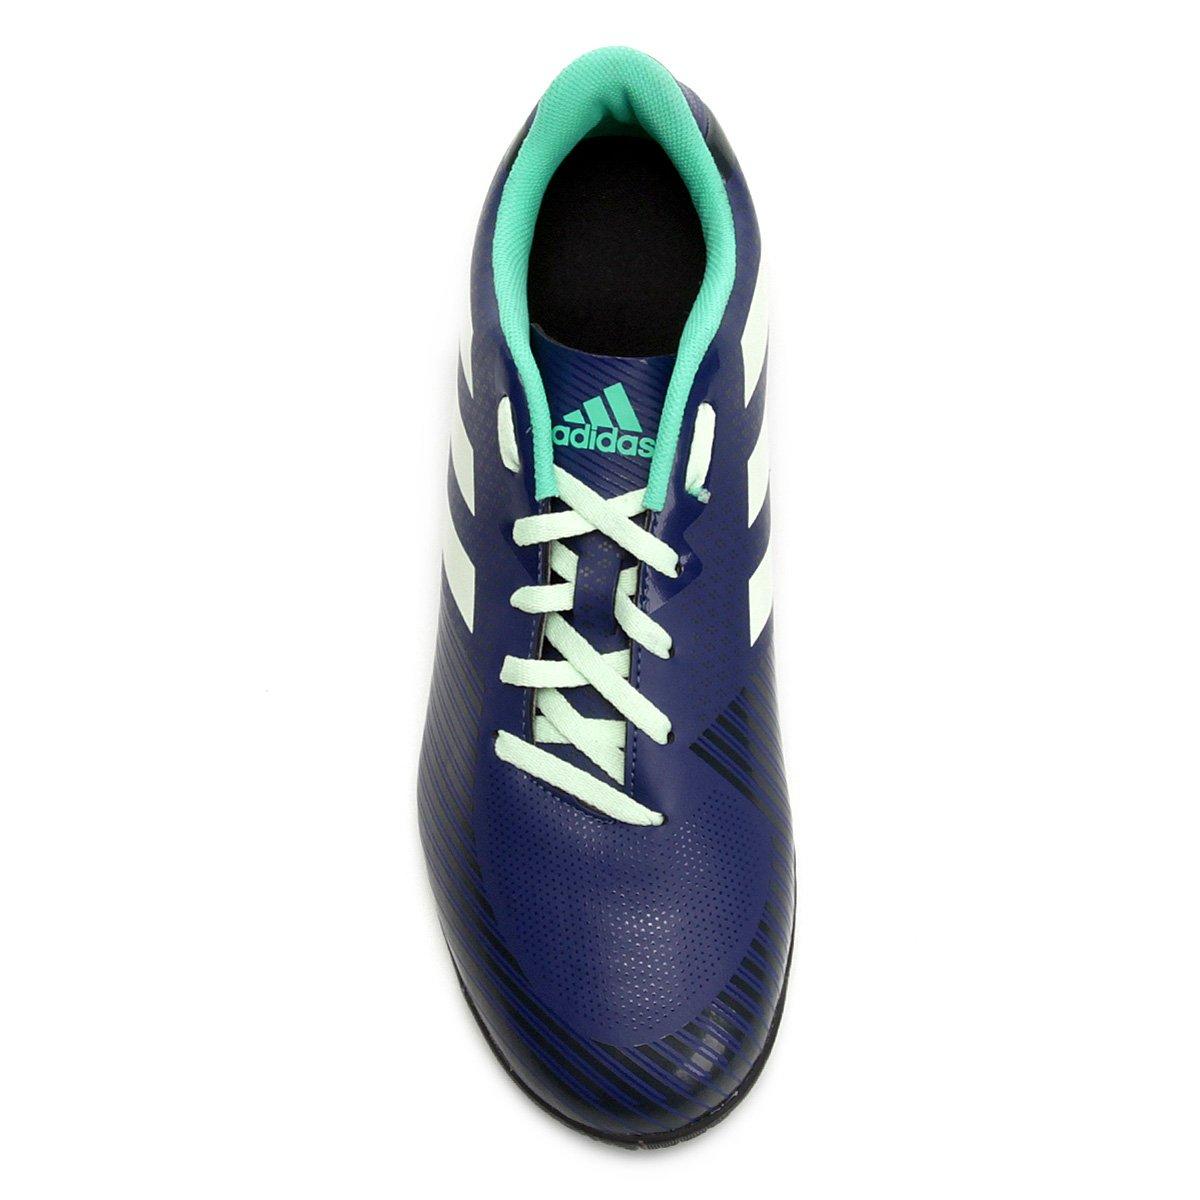 459ca65b97 Chuteira Futsal Adidas Artilheira 18 IN - Azul e Verde - Compre ...